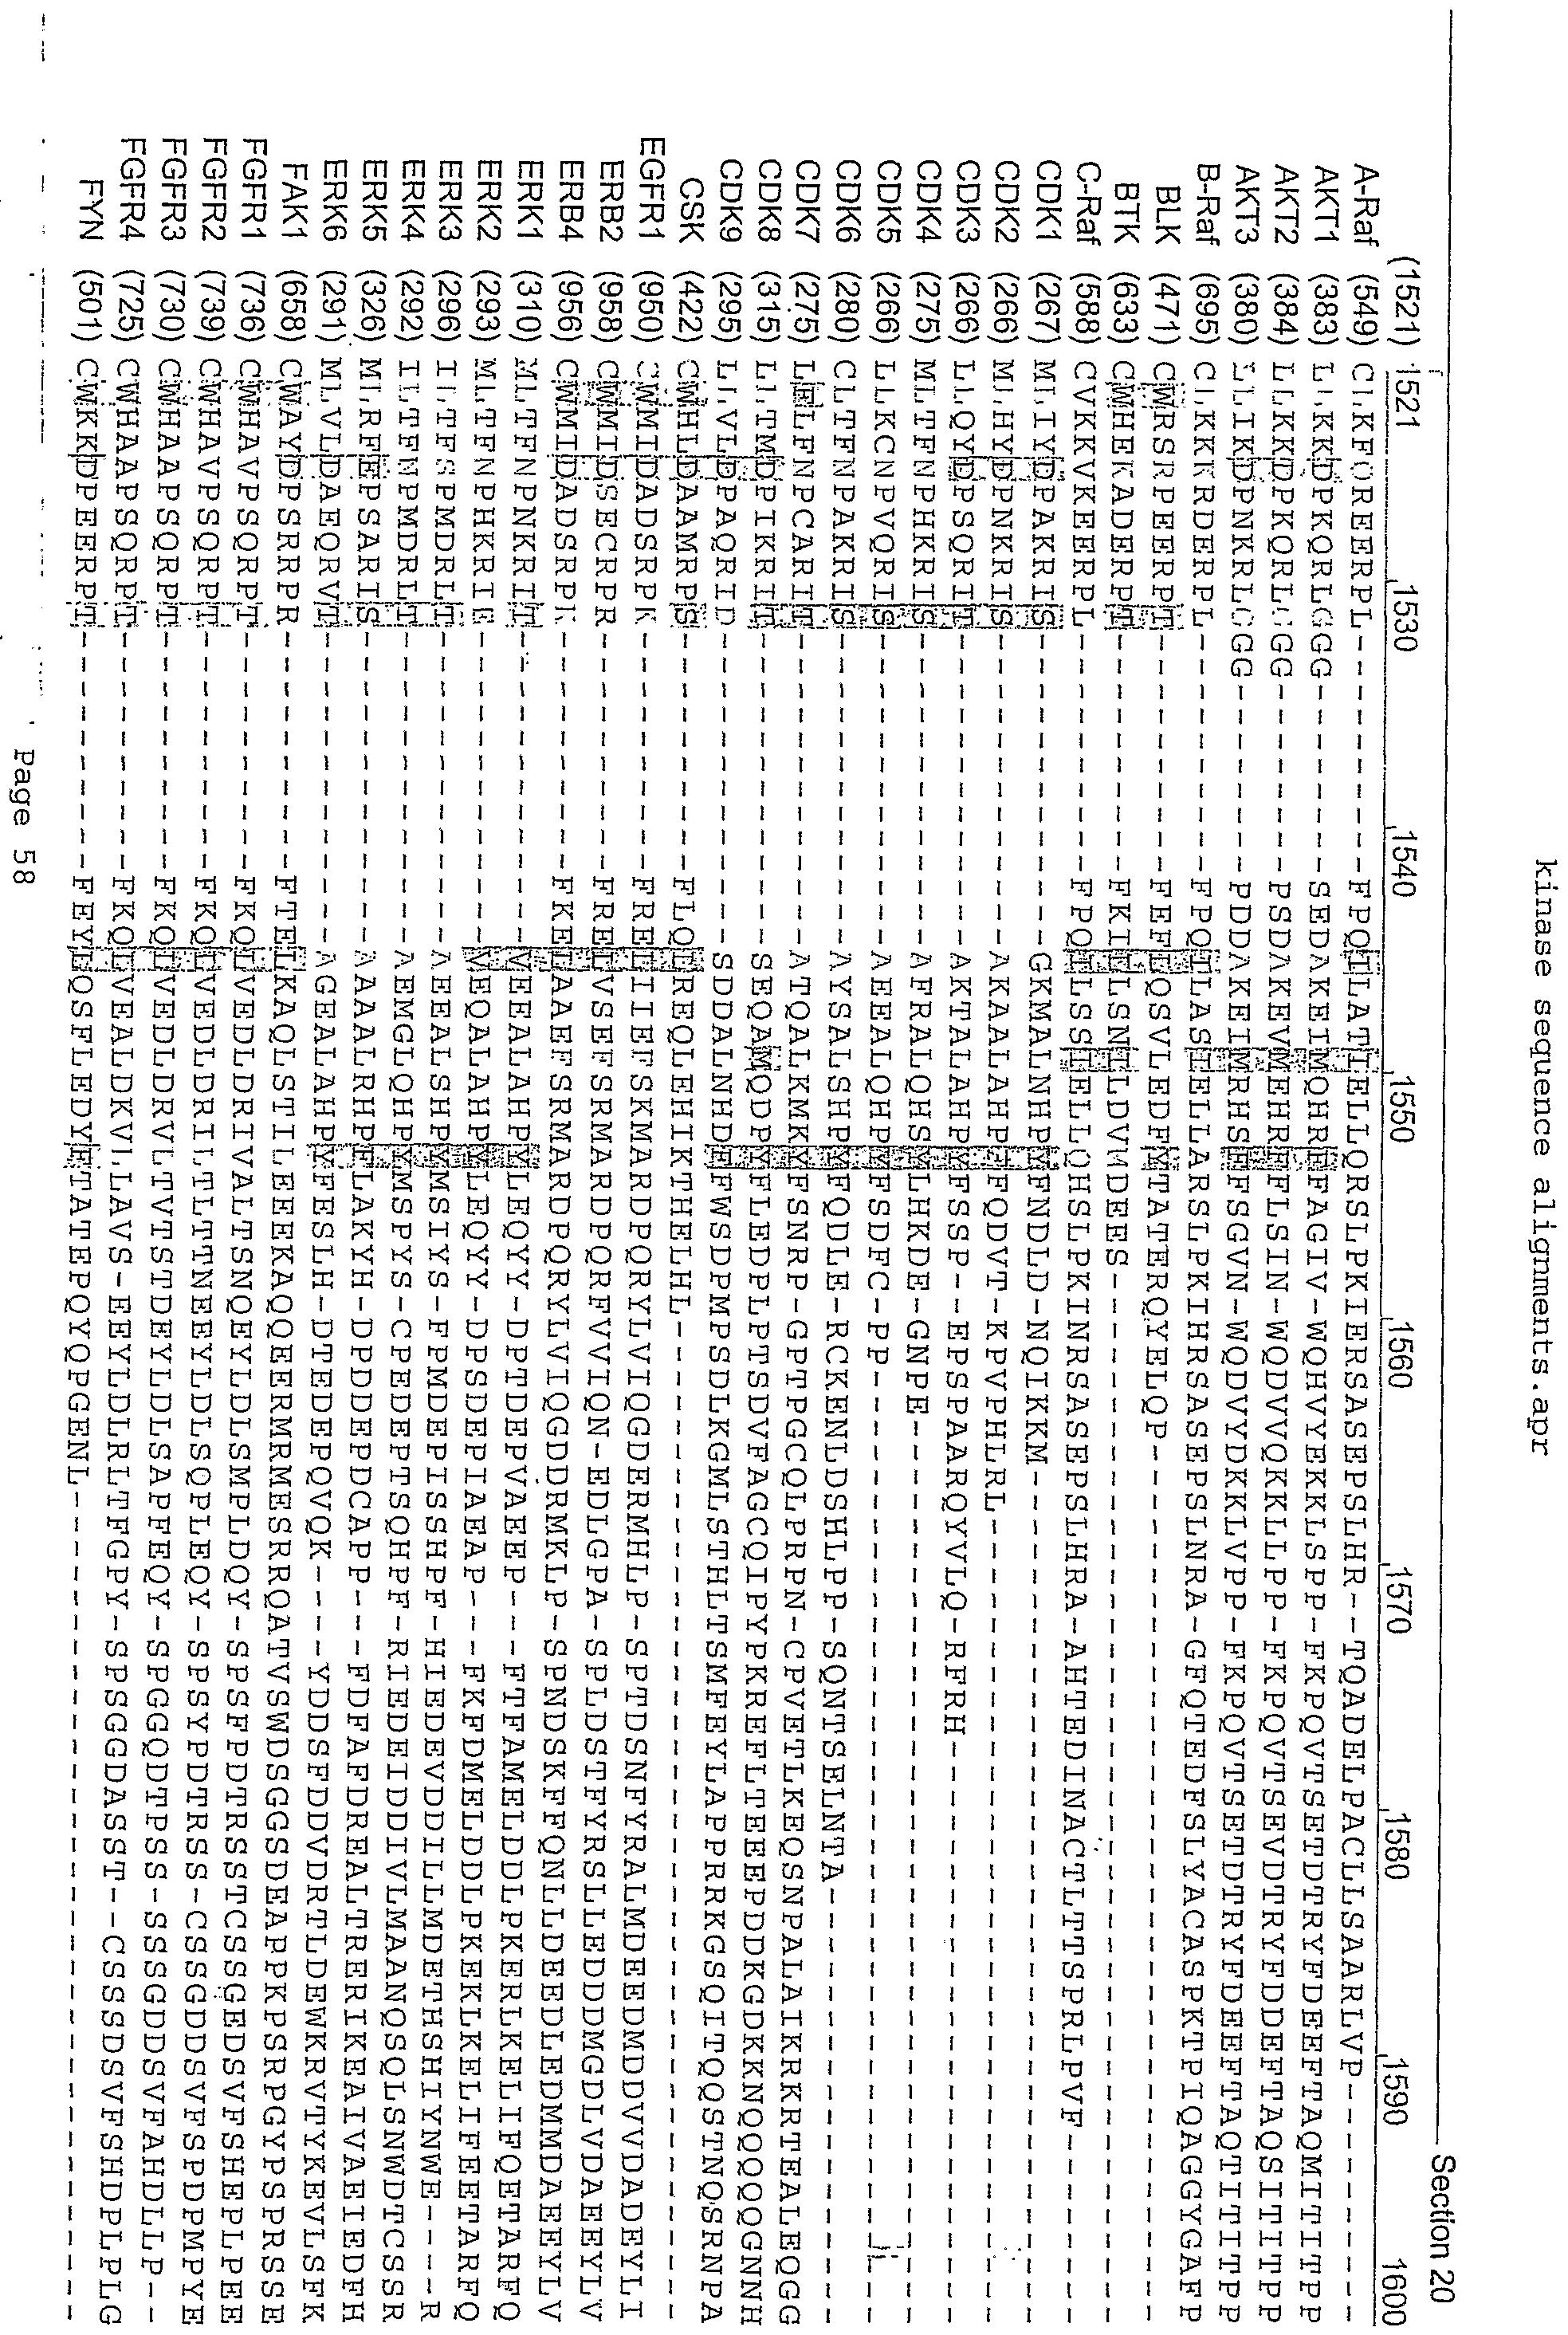 N910c Nv Data Download